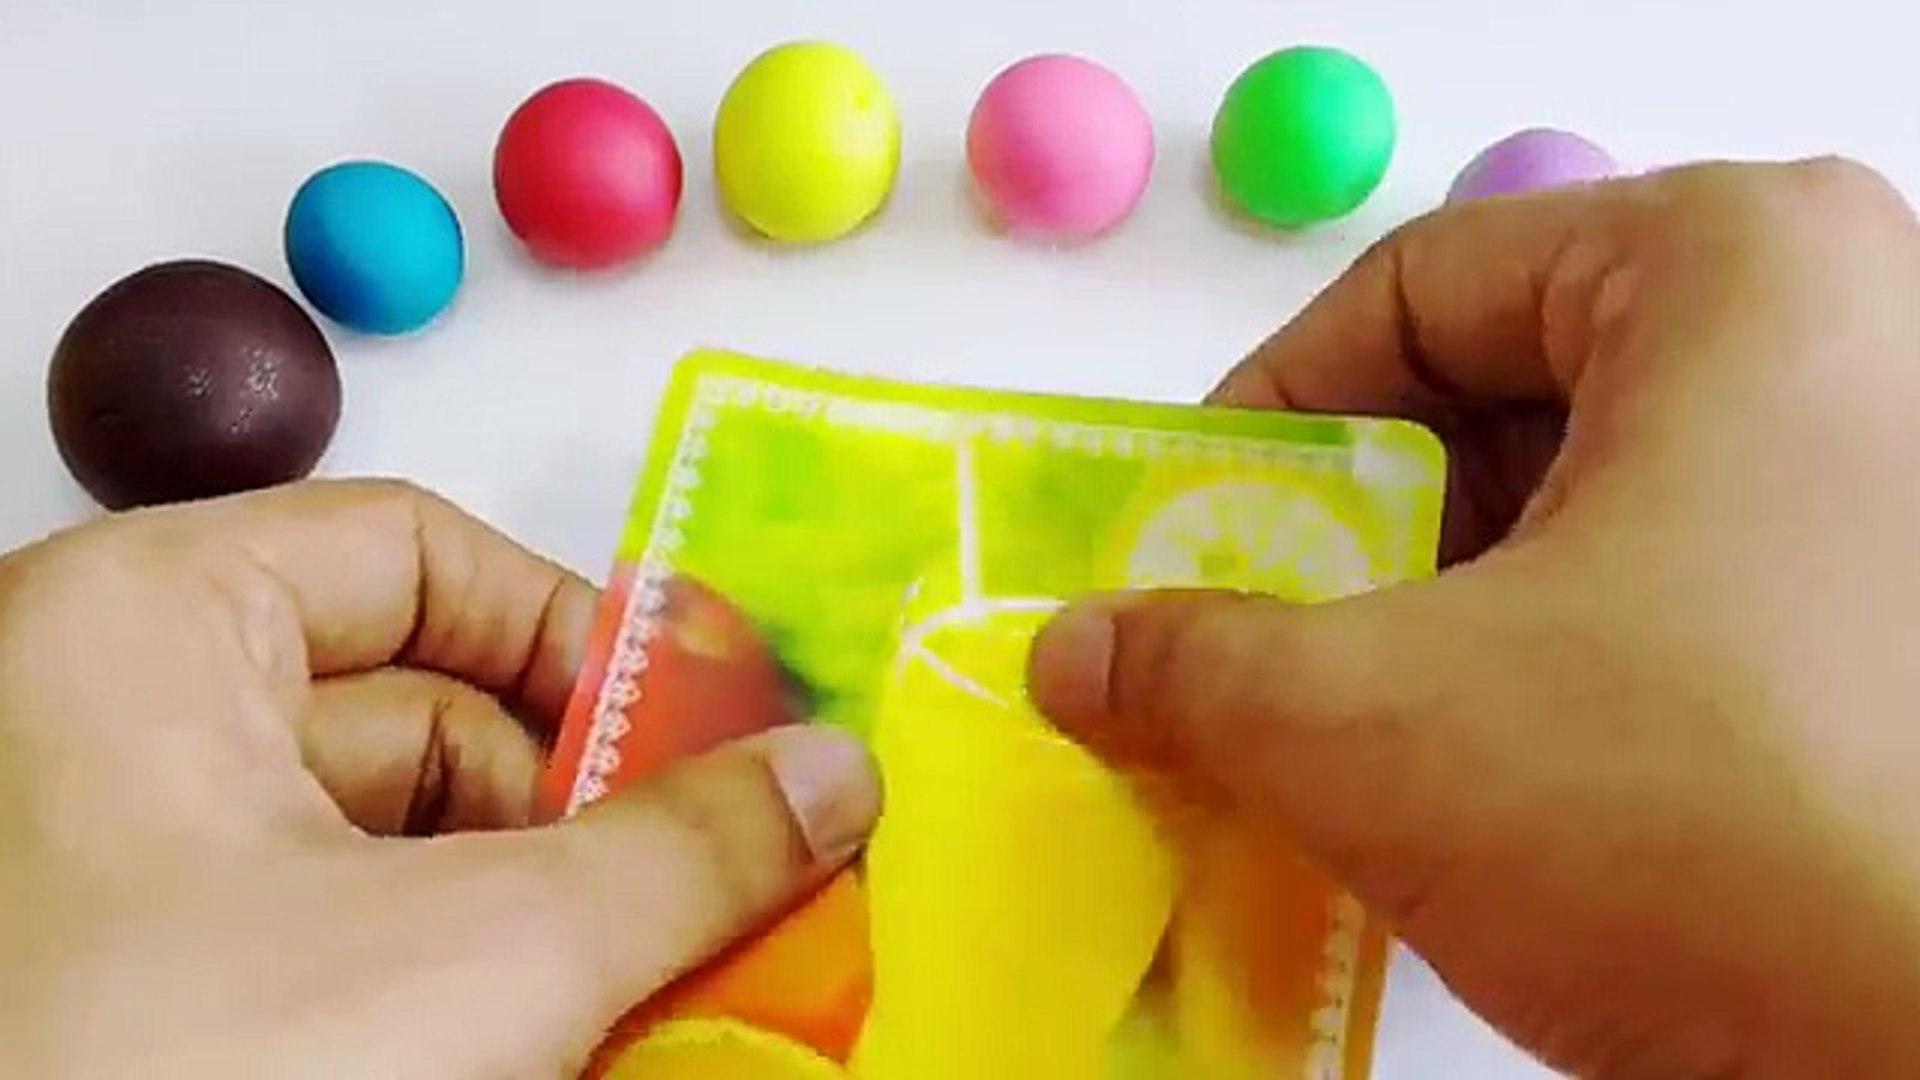 Rainbow Ice Cream Sandwich Recipe With Play Doh! Easy Fun to Learn Rainbow Icecream Sandwich